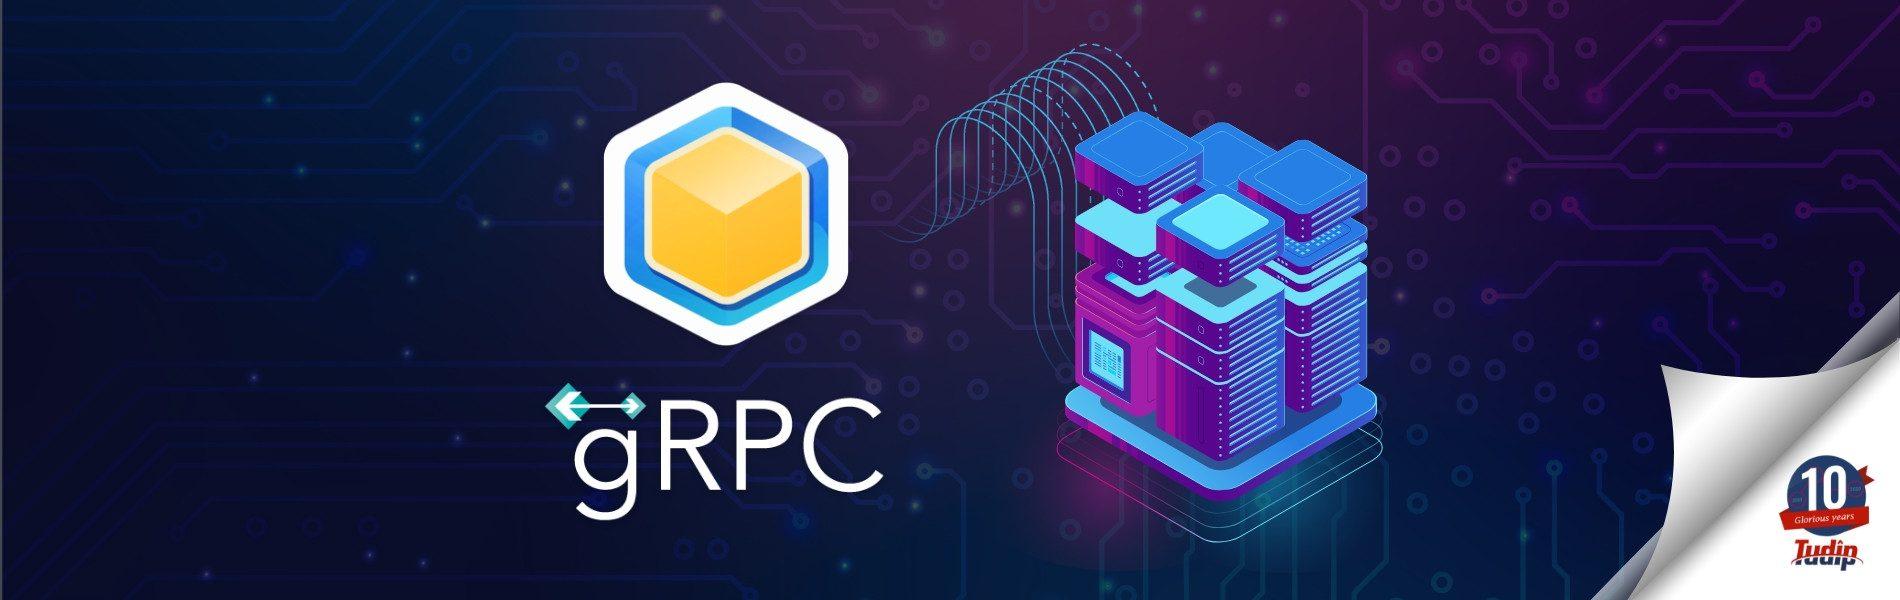 gRPC_Server_inside_Asylo_Enclave